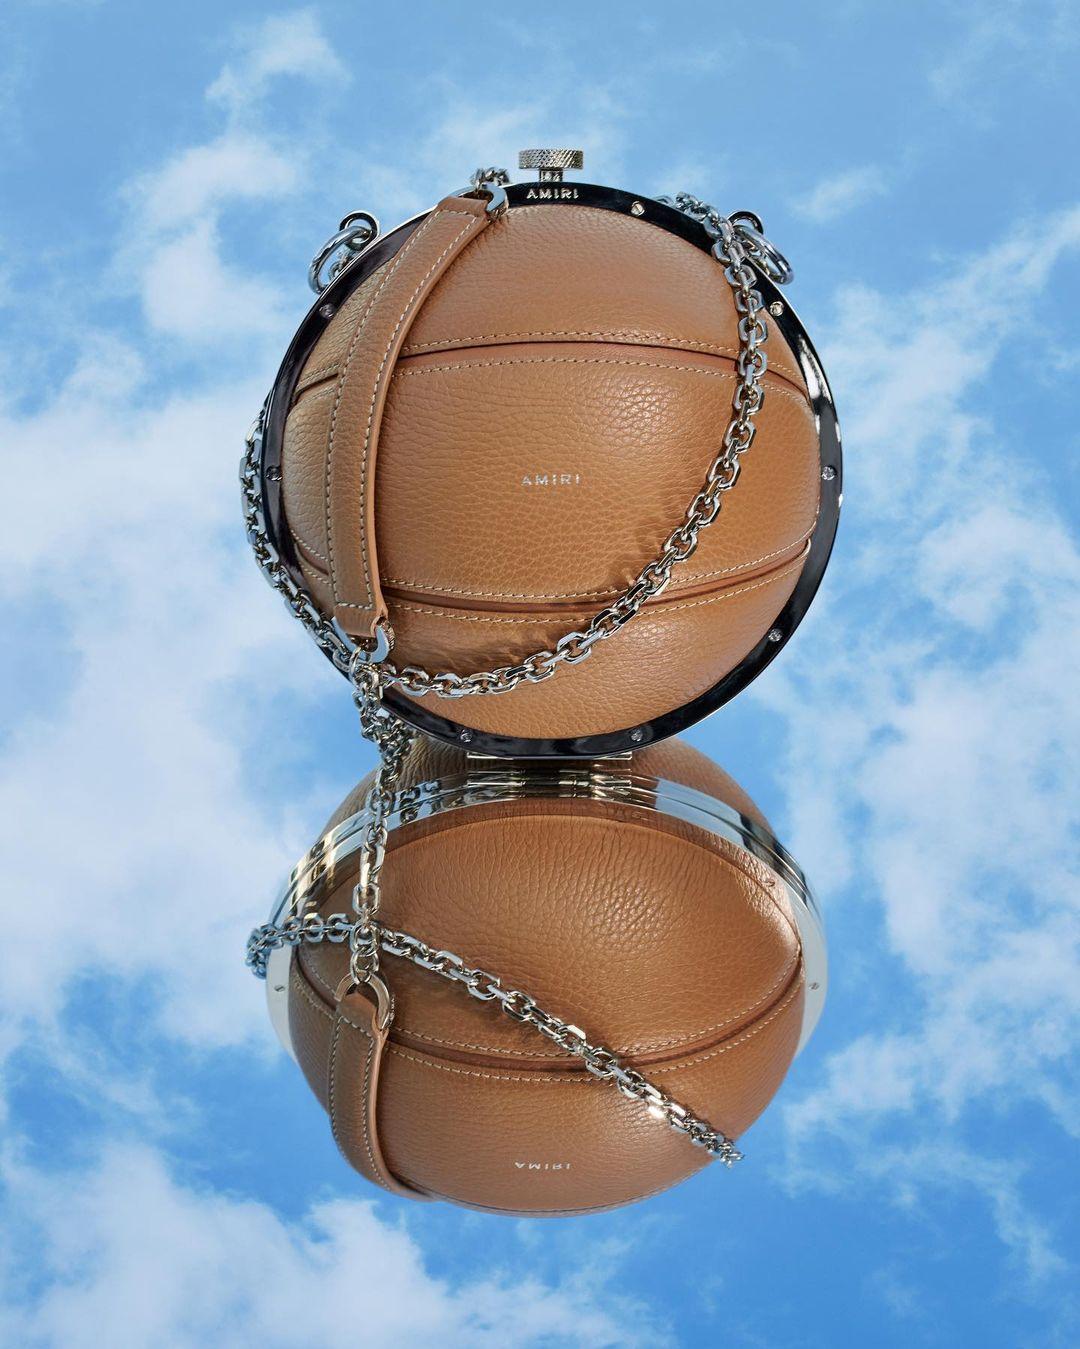 PAUSE or Skip: AMIRI Basketball Bag